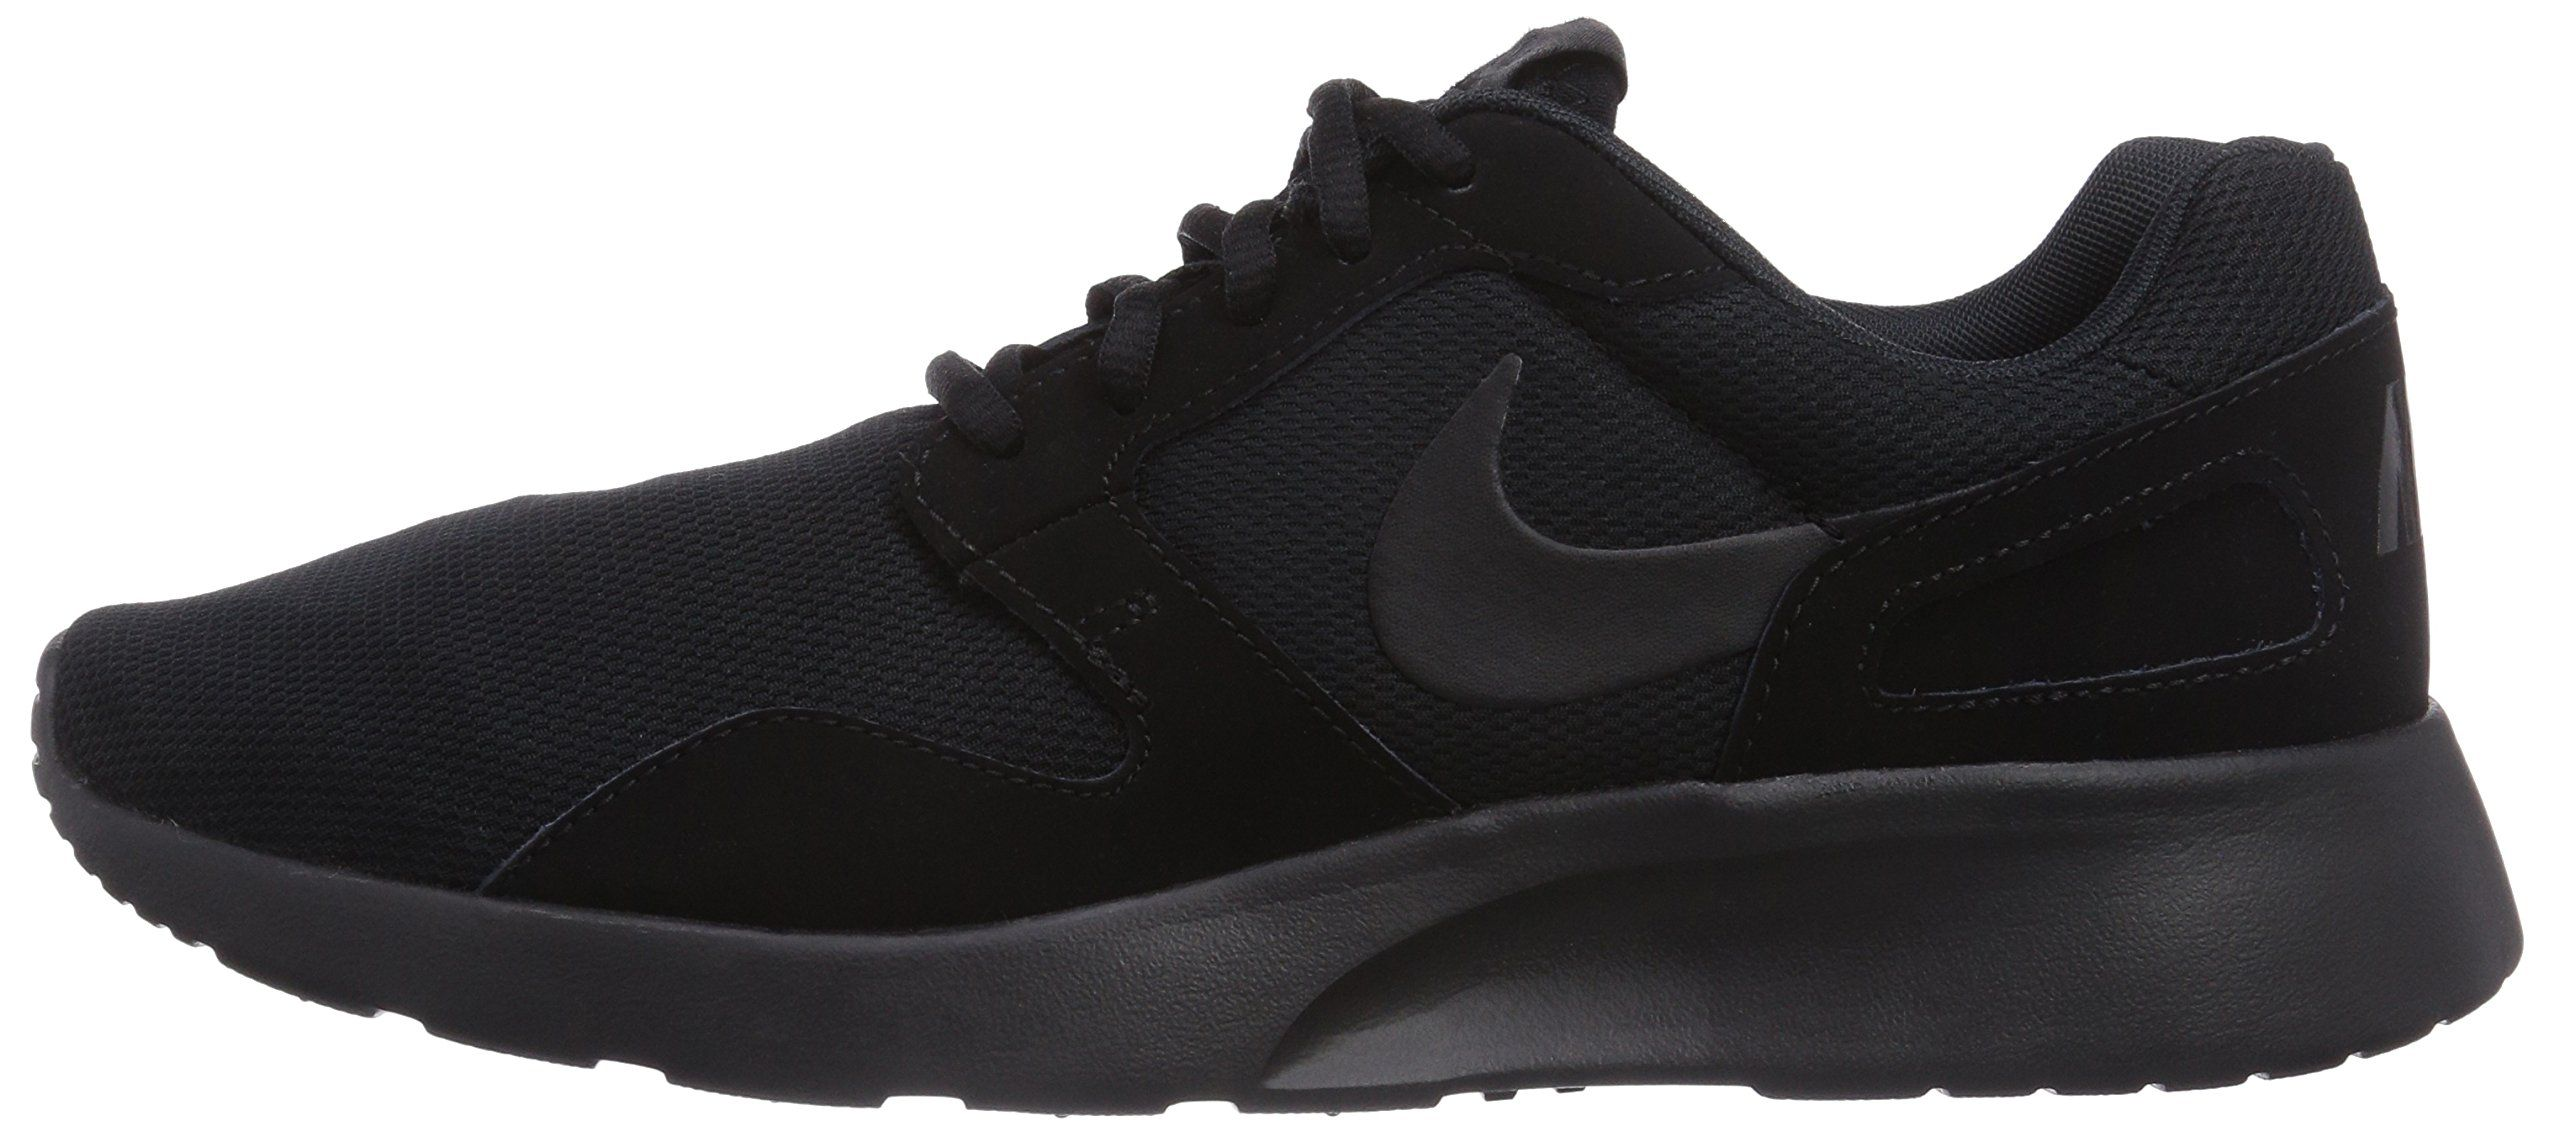 the latest 14867 728a3 Amazon.com   Nike Men's Roshe One Running Shoes   Running. Nike Roshe One,  Chaussures Multisport Outdoor femme ...